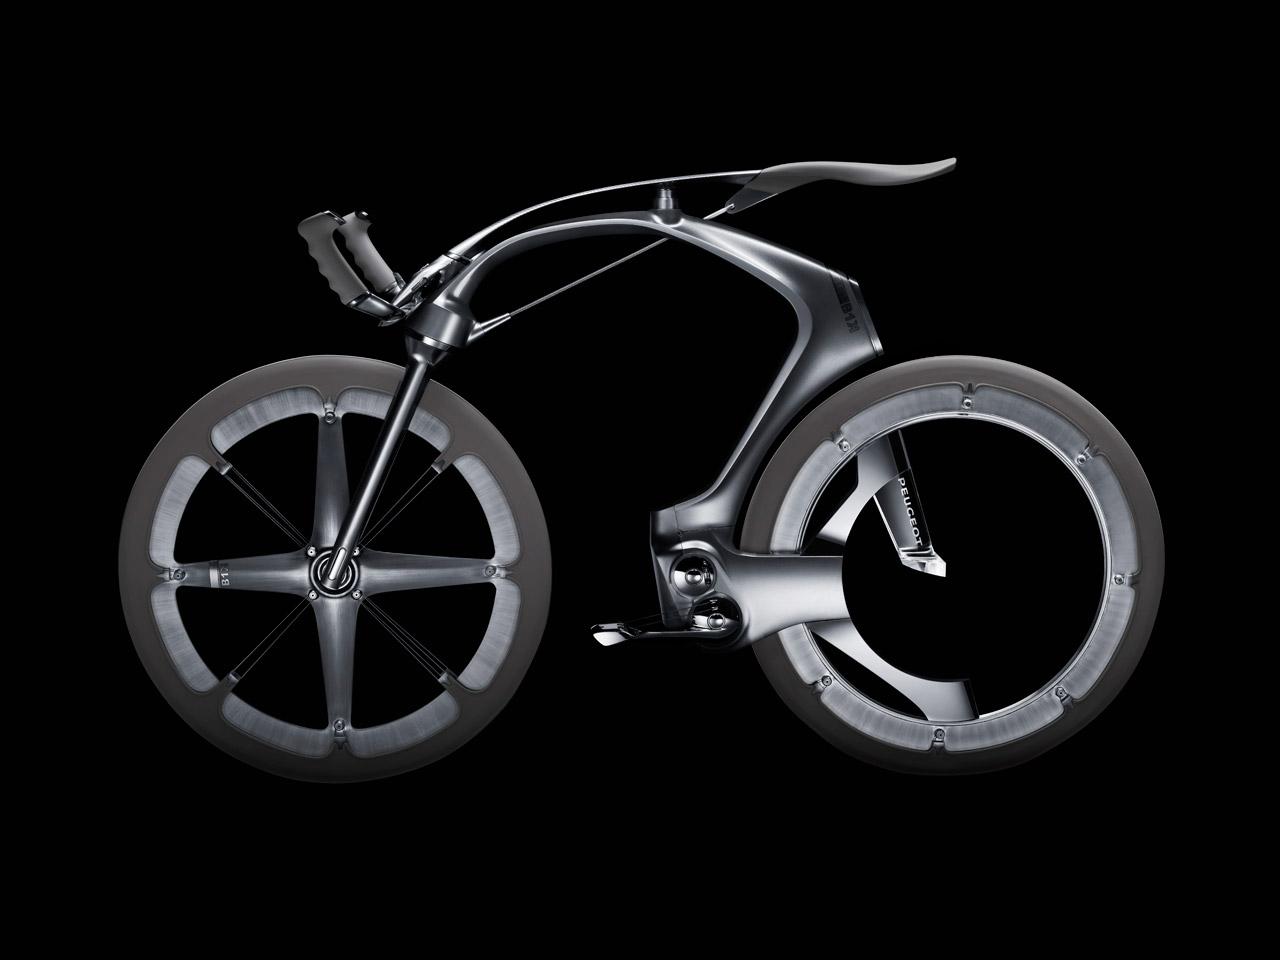 http://www.carbodydesign.com/archive/2010/02/peugeot-b1k-bike-concept/_Peugeot-B1K-Bike-Concept-1-lg.jpg